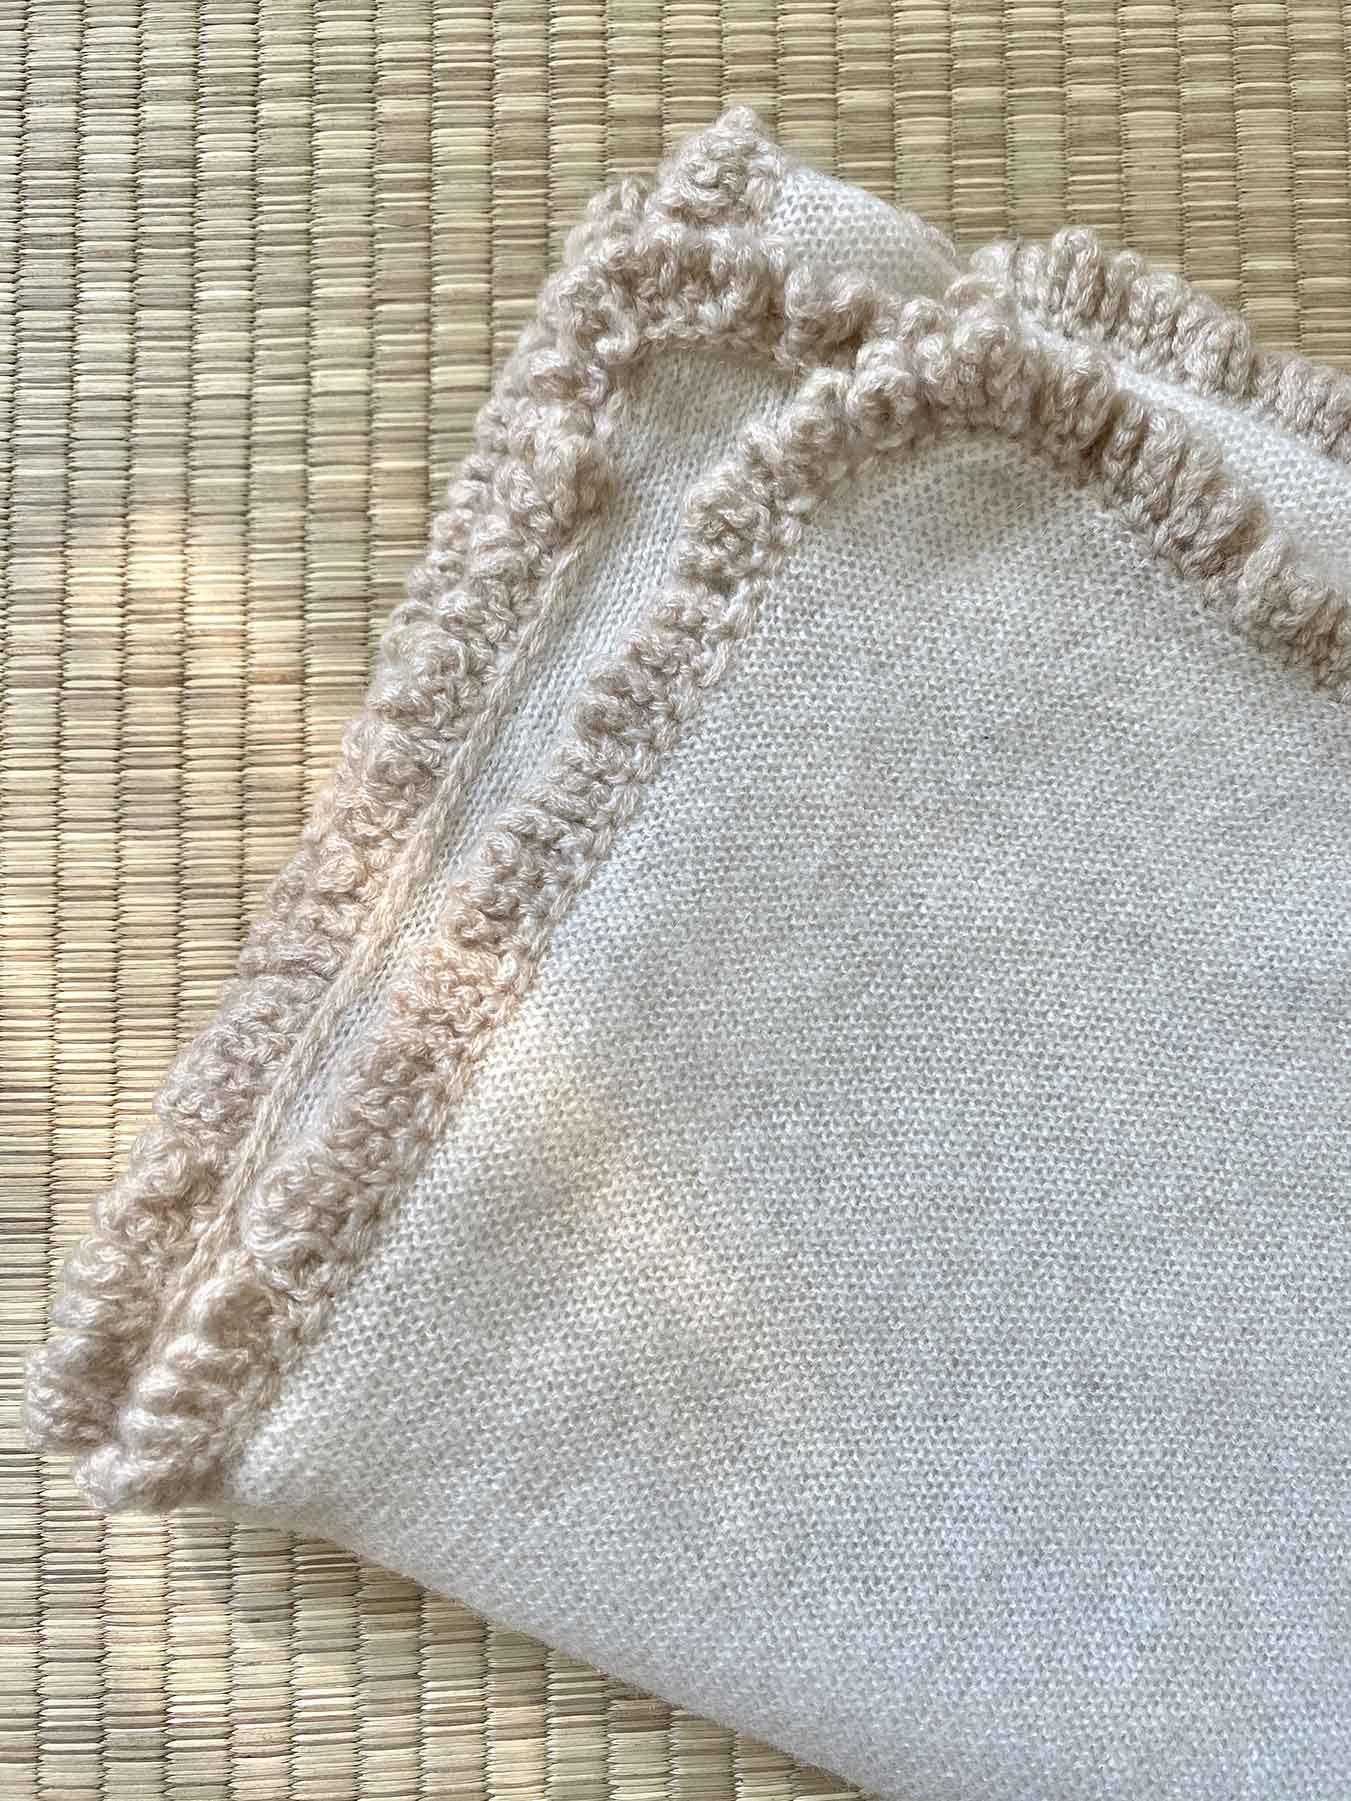 Crochet Loop Fringe Cashmere Scarf Cream 6